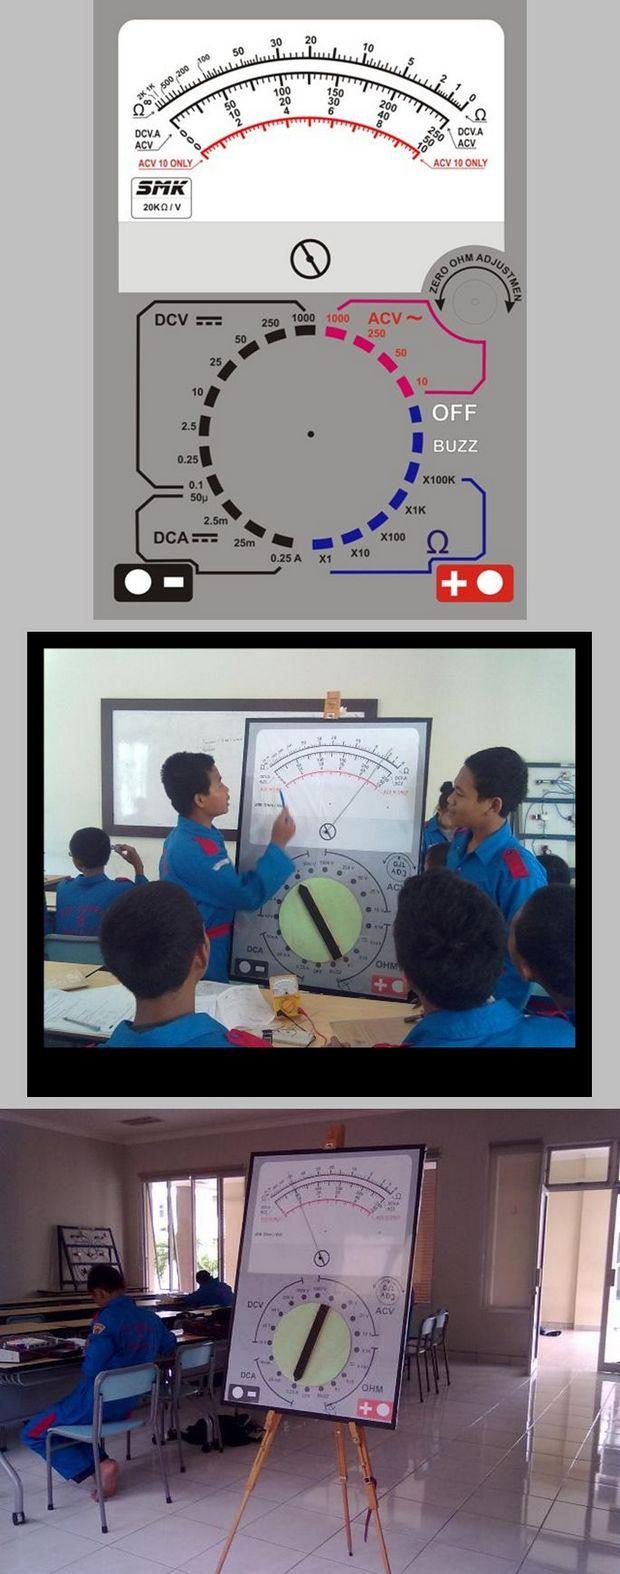 elektronik-gorsel-multimetre-gorseli-avo-metre-gorseli-avo-metre-coreldraw